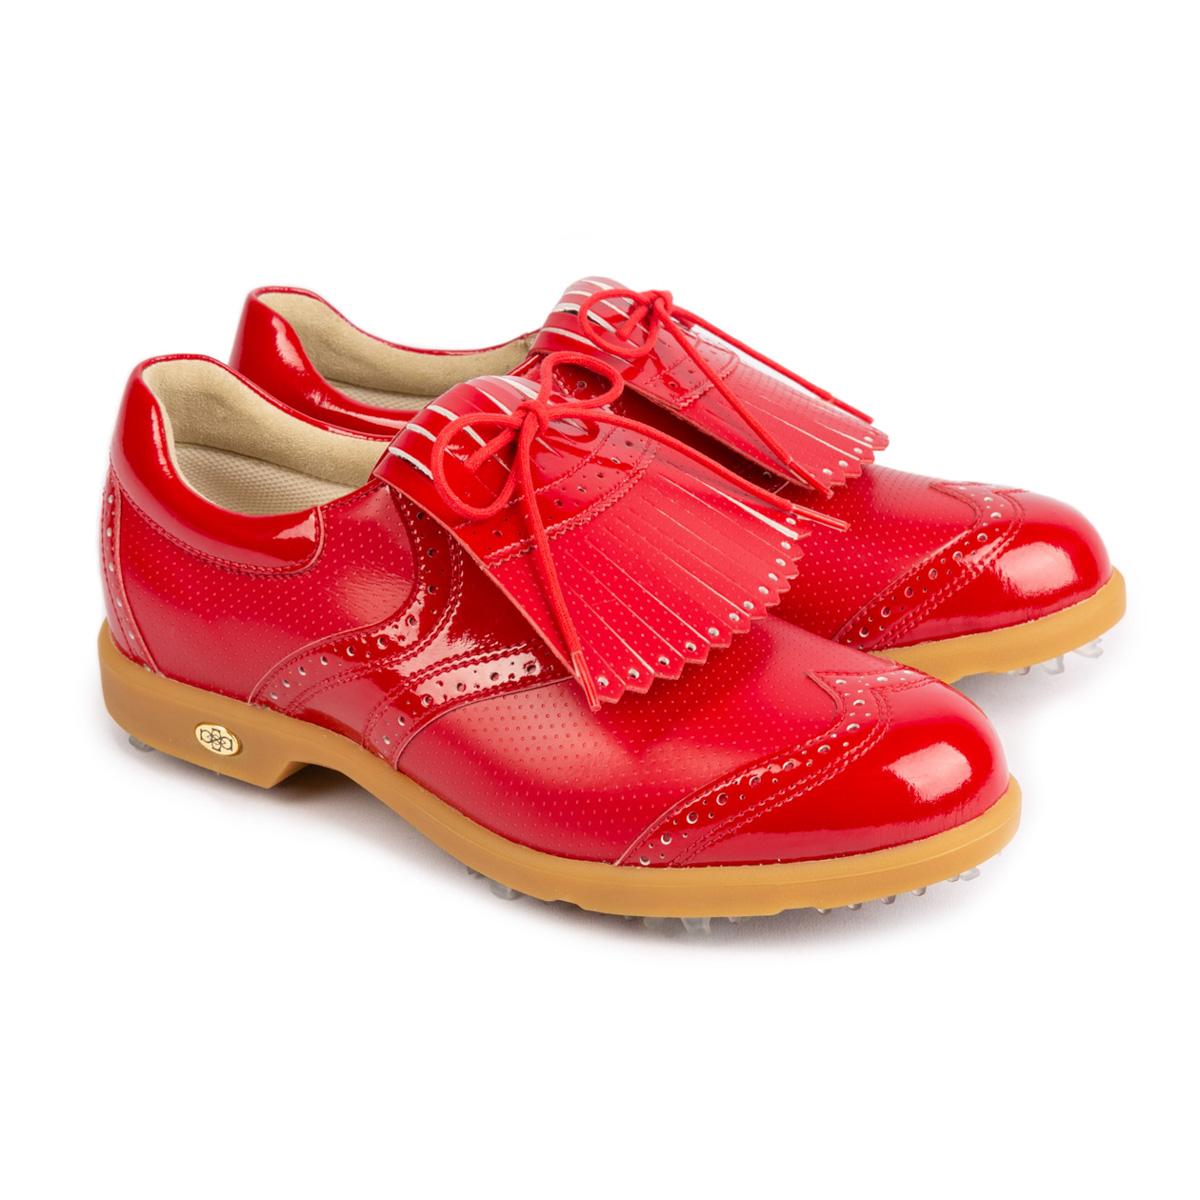 SOPHIA ~ソフィア~ patent-red